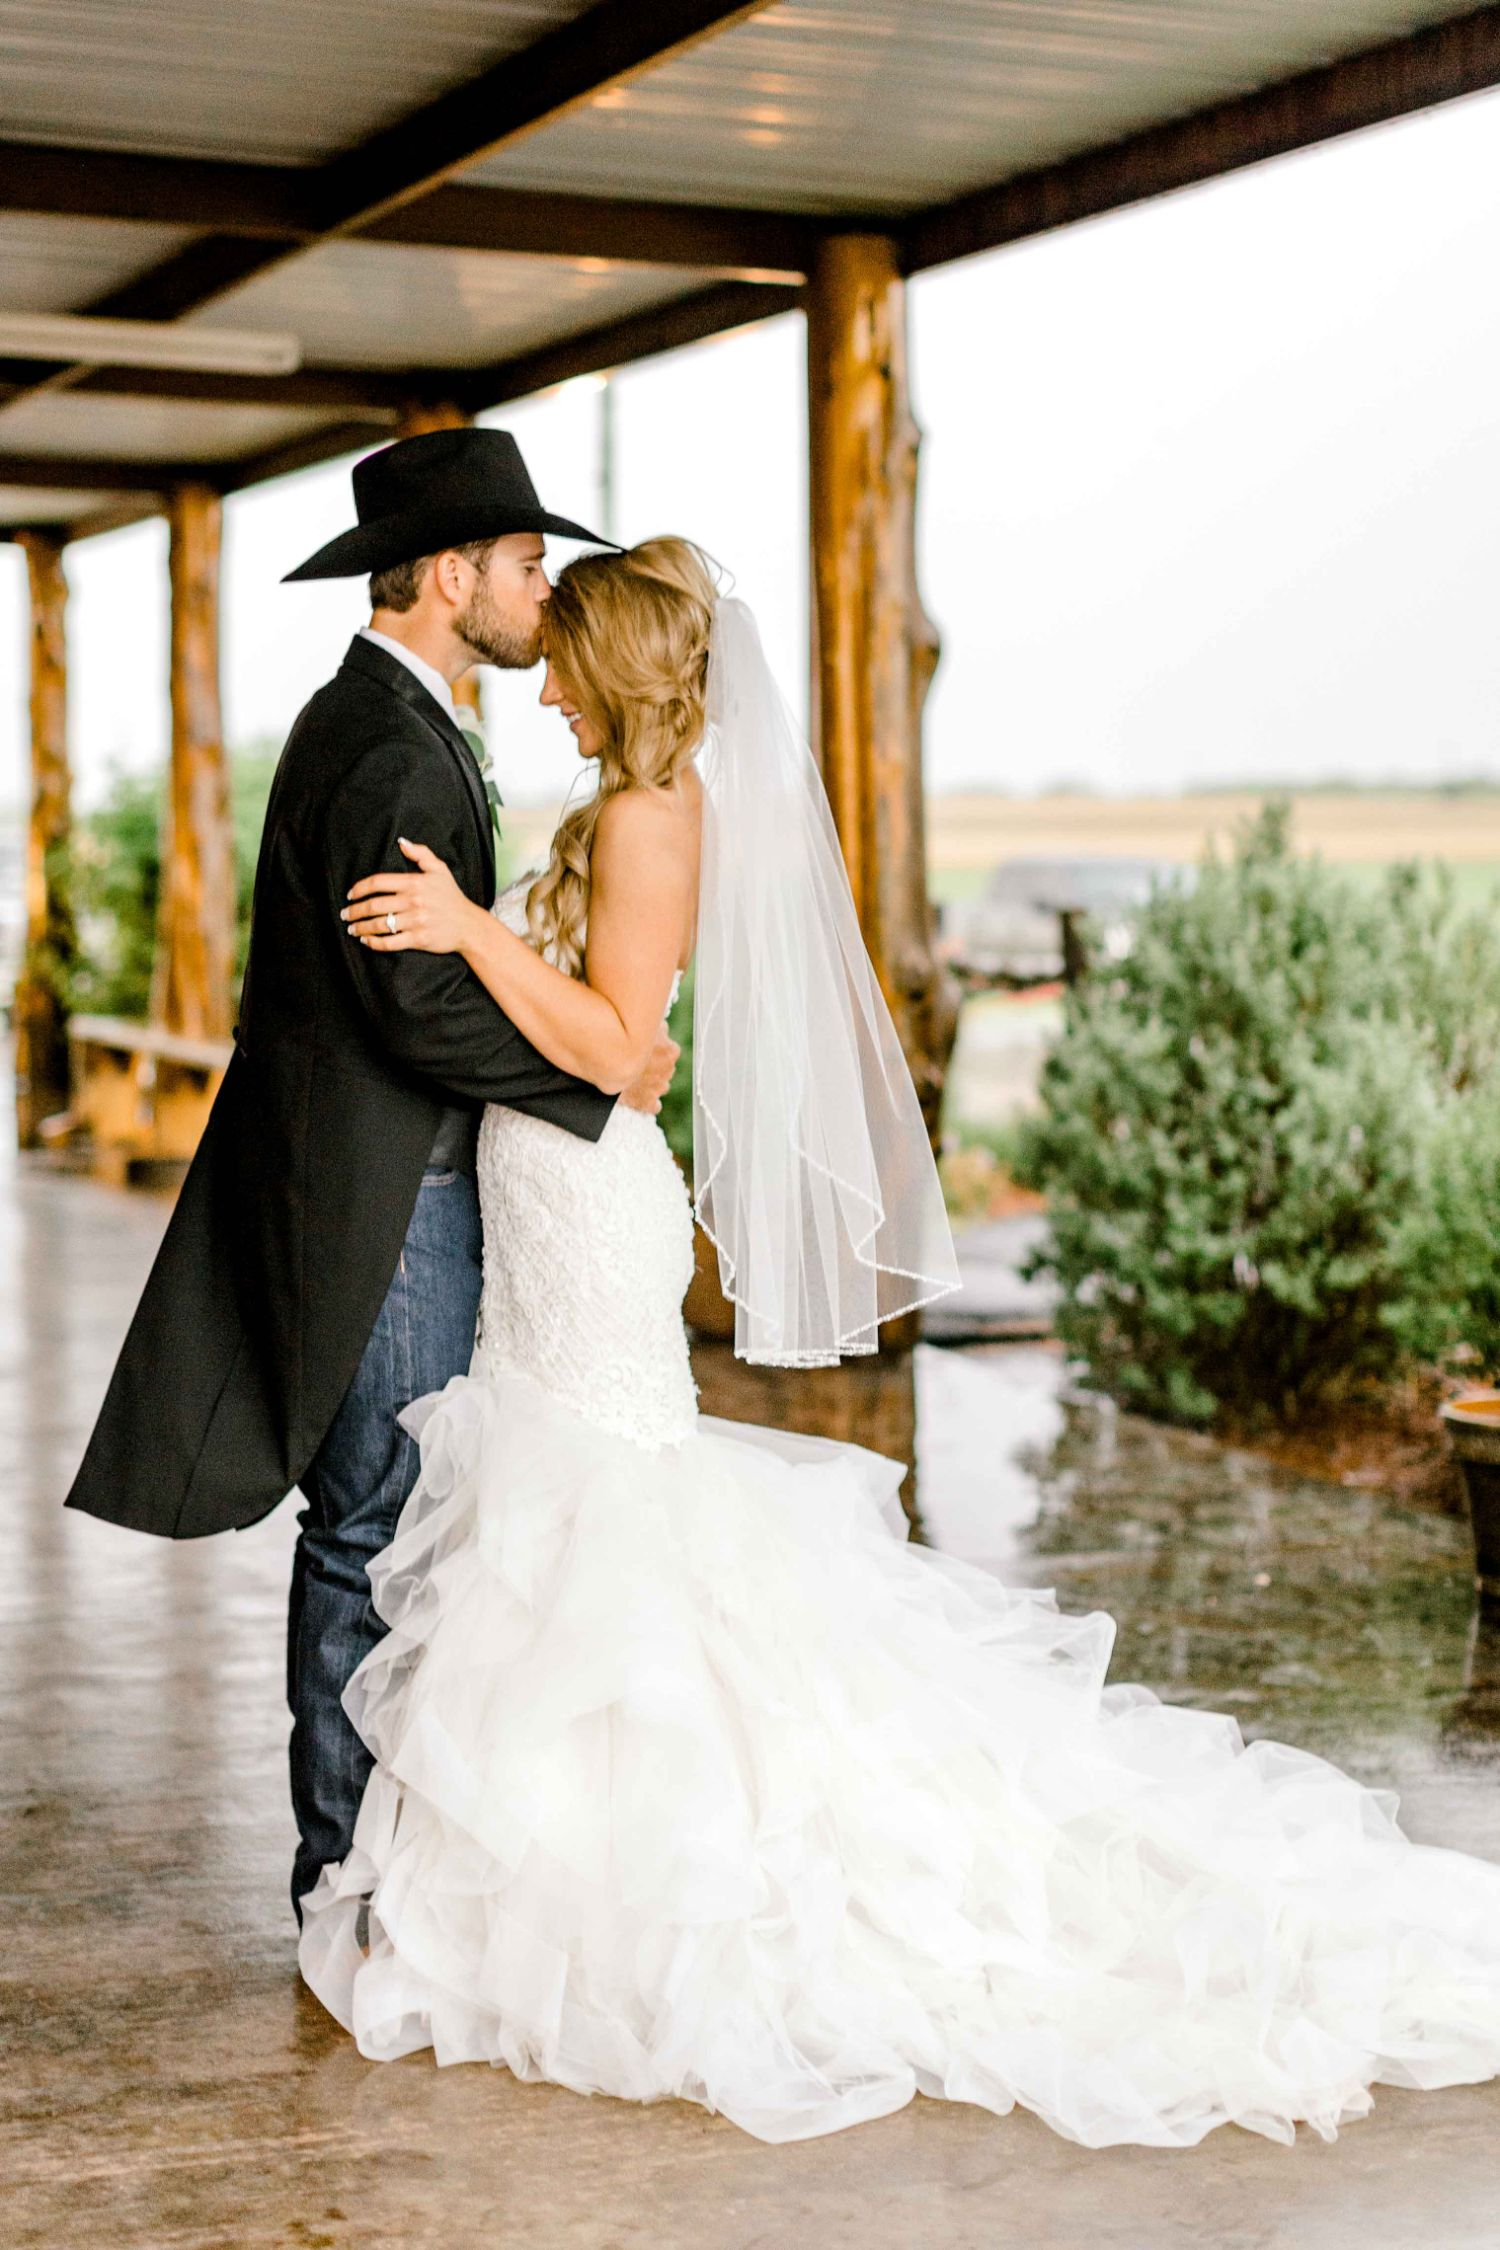 wichita-falls-wedding-katelyn-colten-vernon-texas-36.jpg